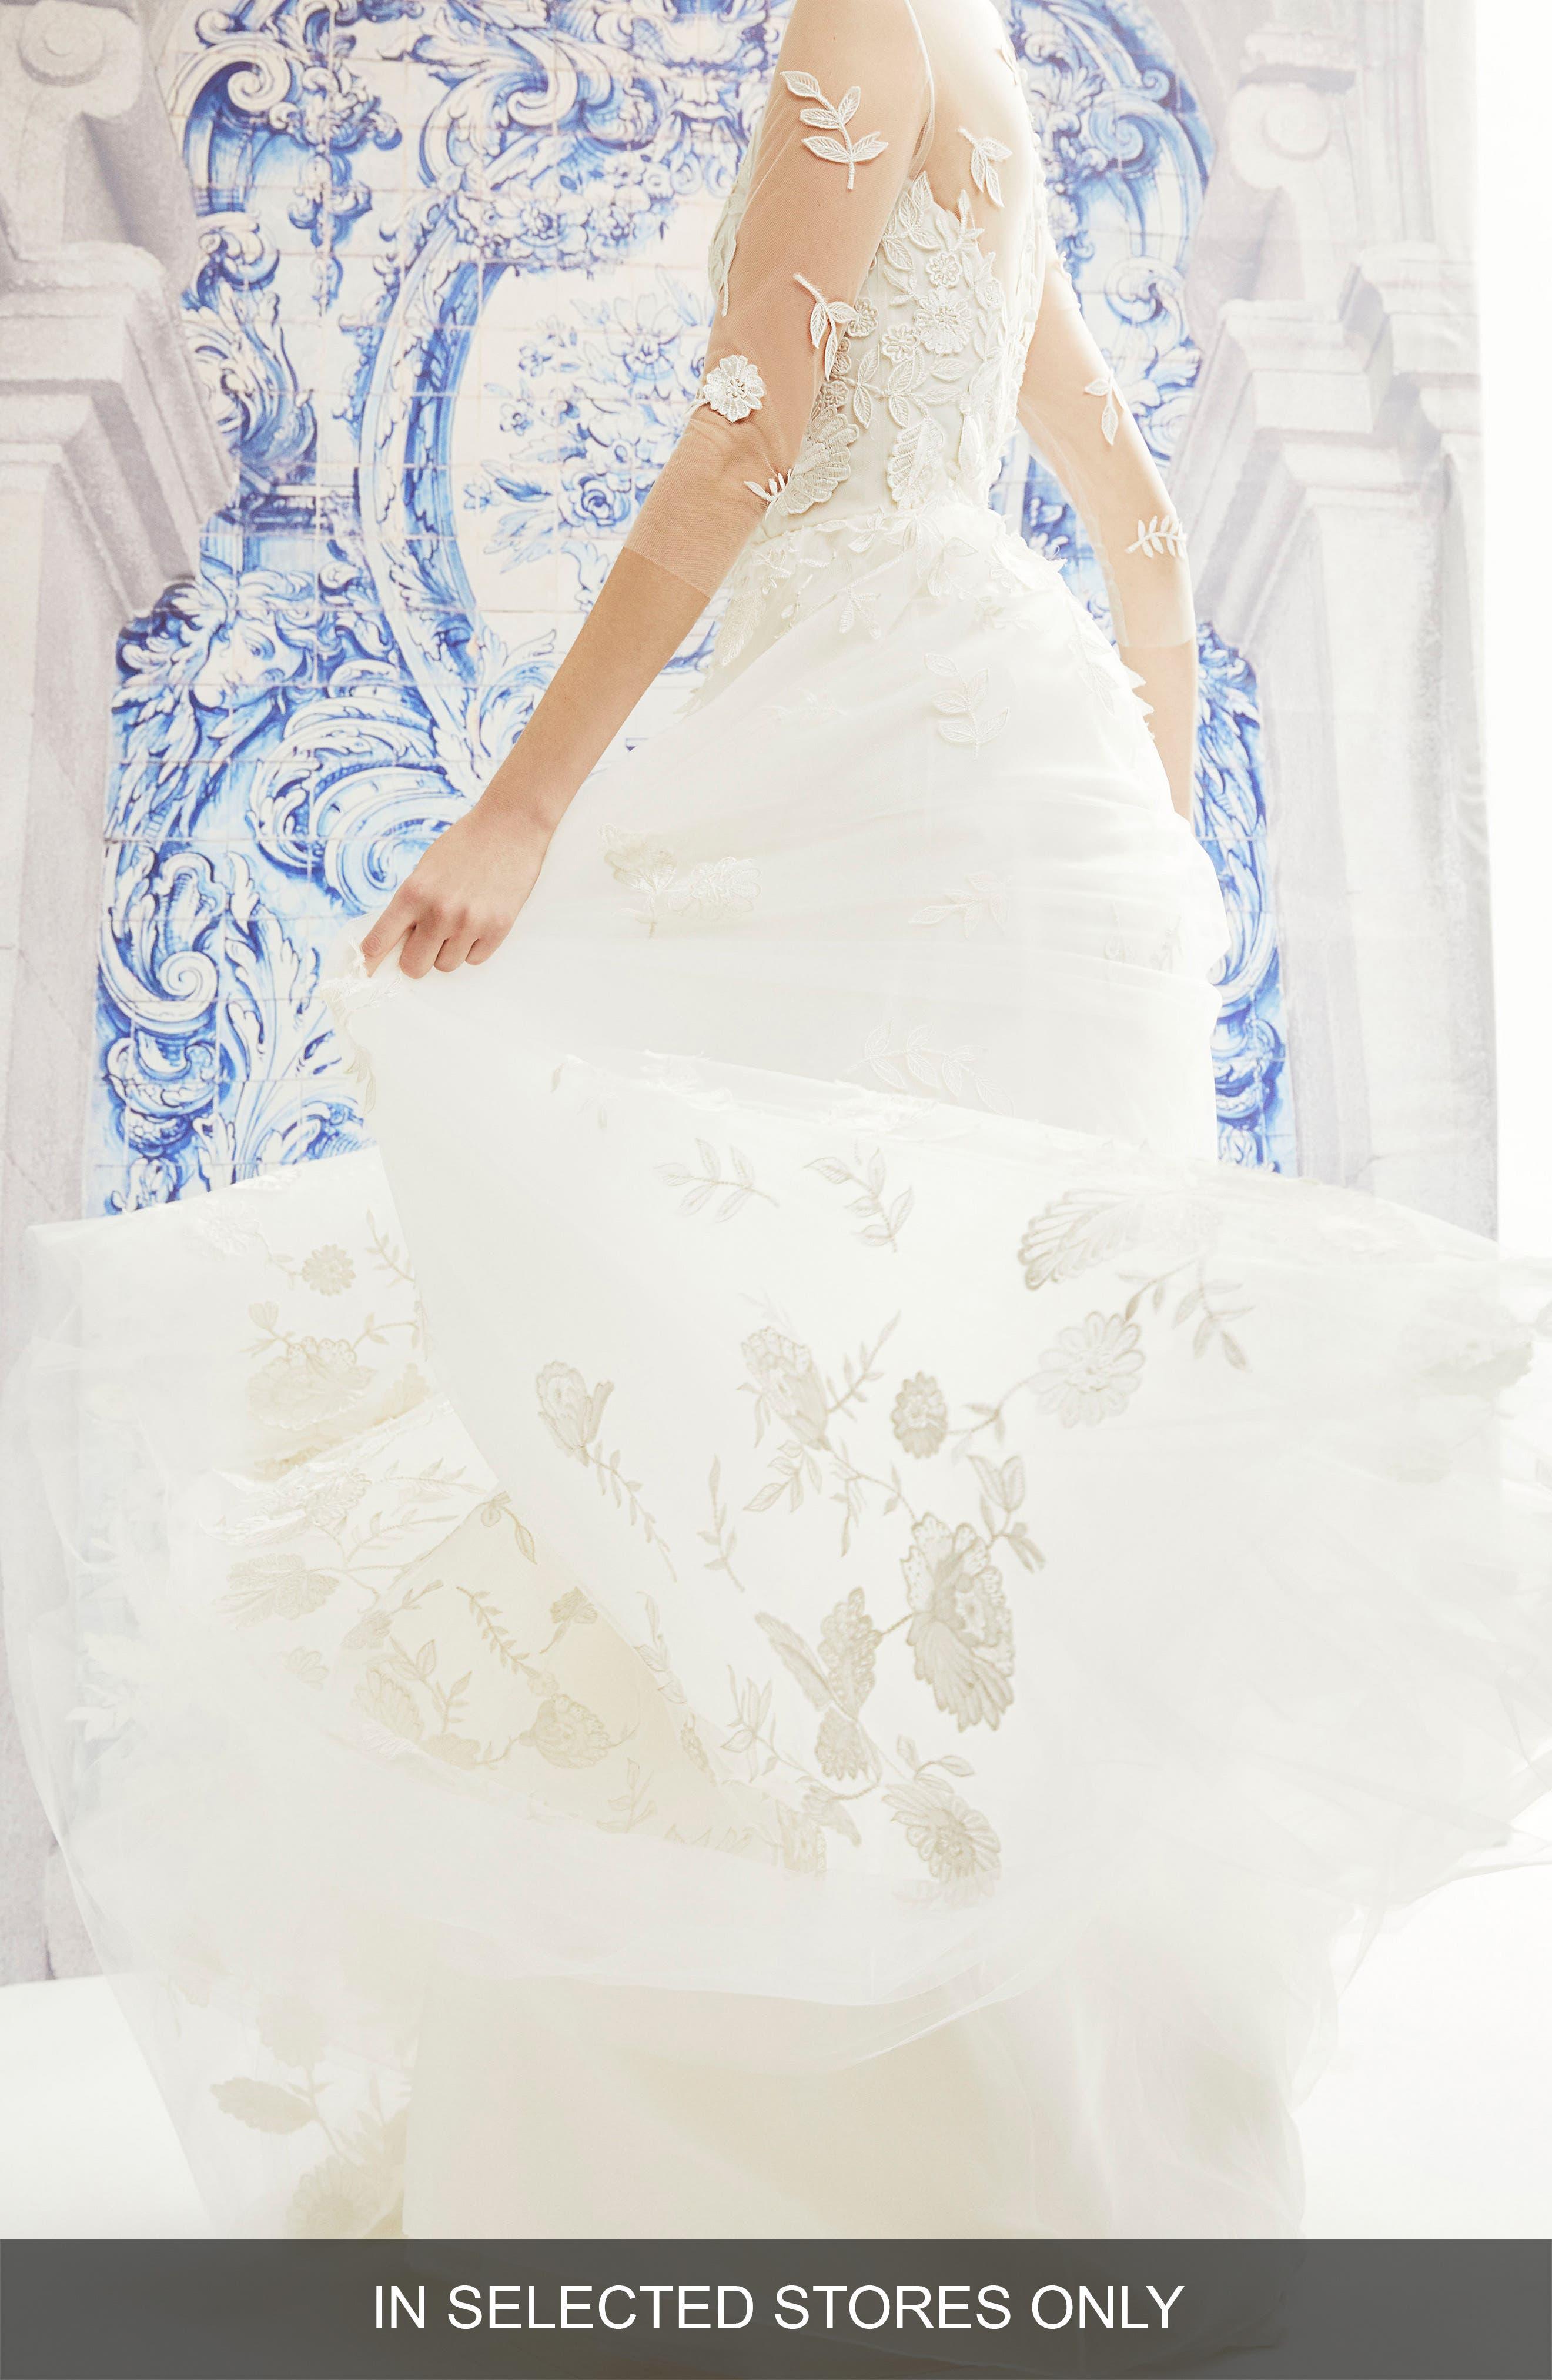 CAROLINA HERRERA India Floral Embroidered Tulle Wedding Dress, Main, color, IVORY